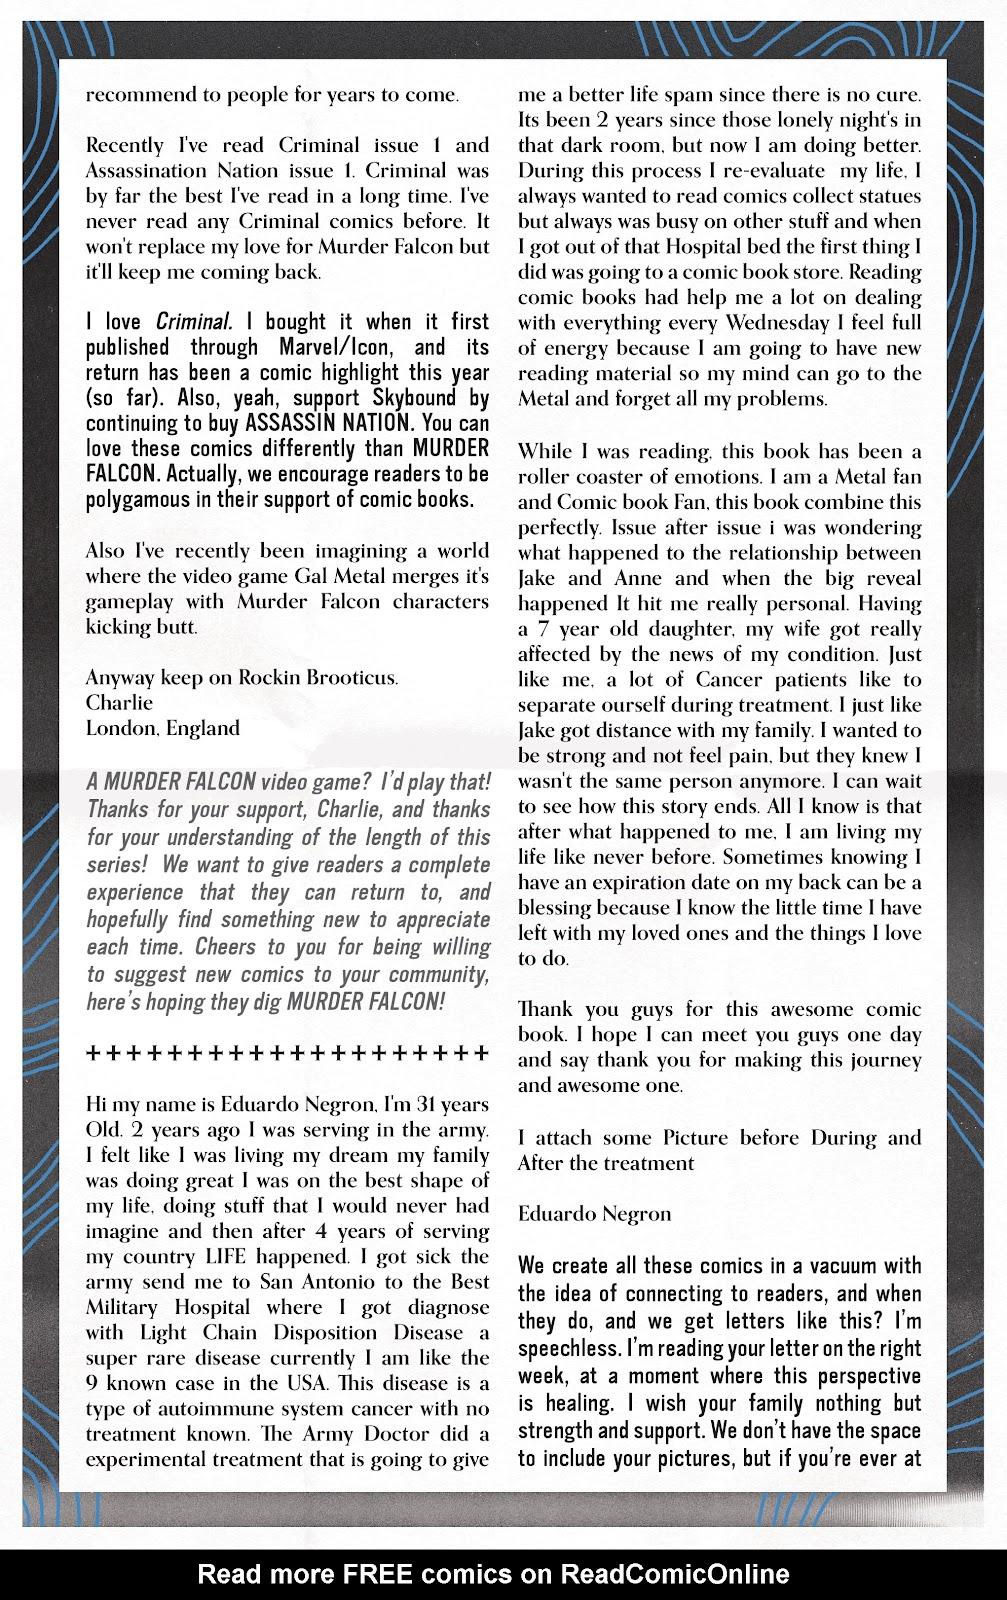 Read online Murder Falcon comic -  Issue #8 - 28